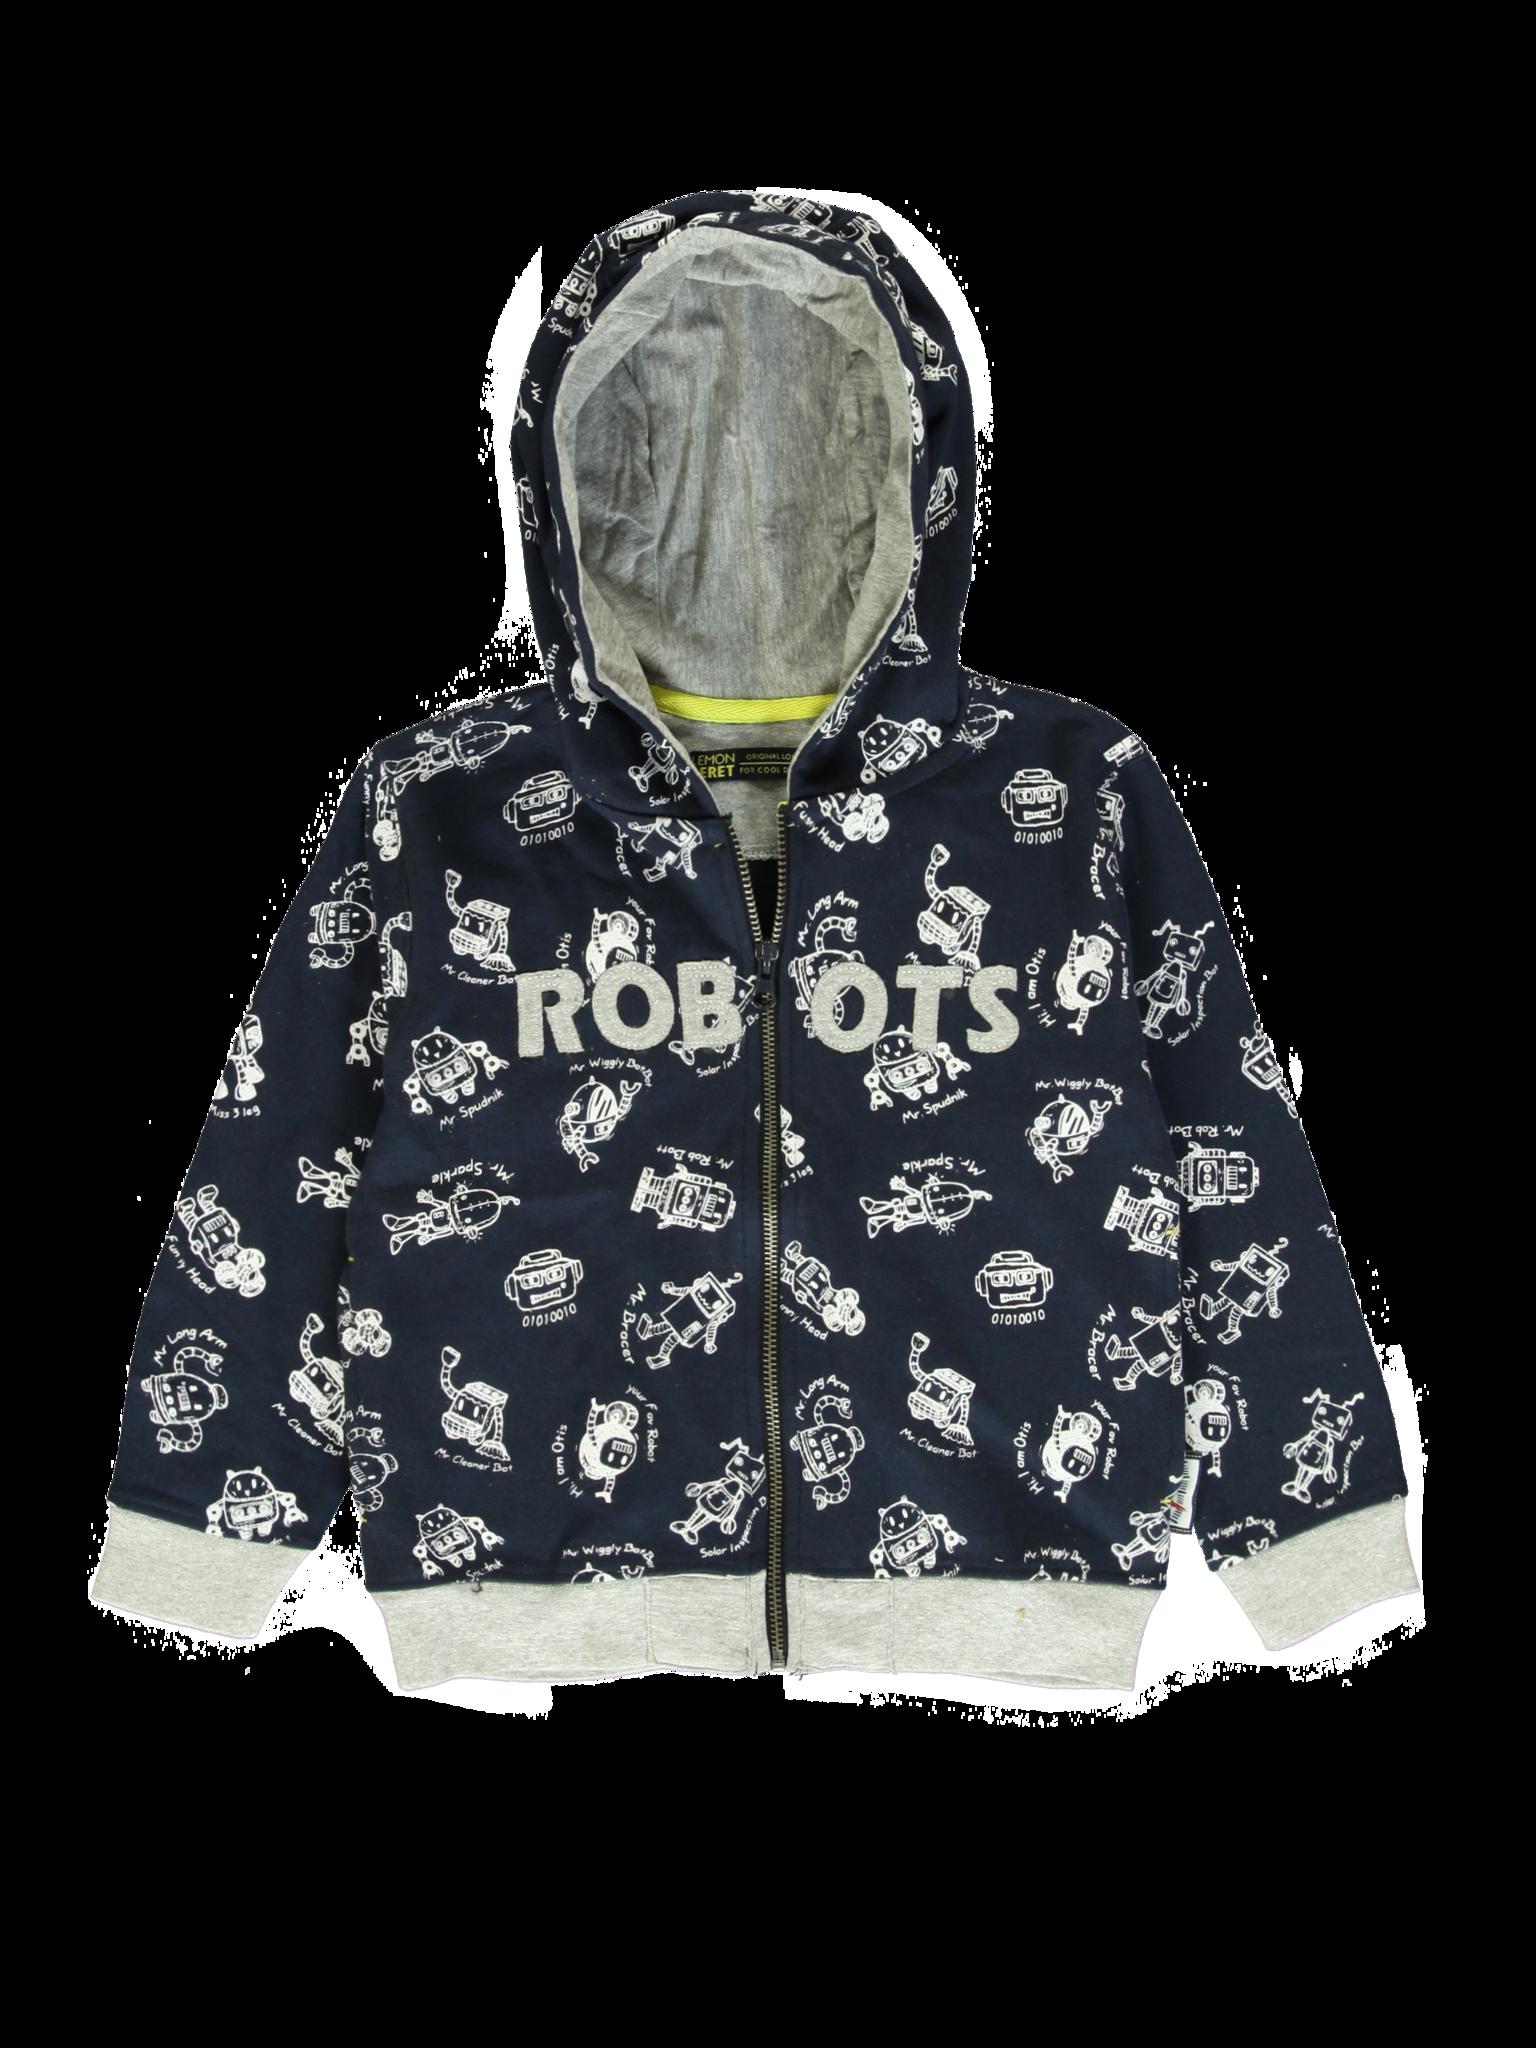 All Brands   Winterproducts Small Boys   Cardigan Sweater   12 pcs/box